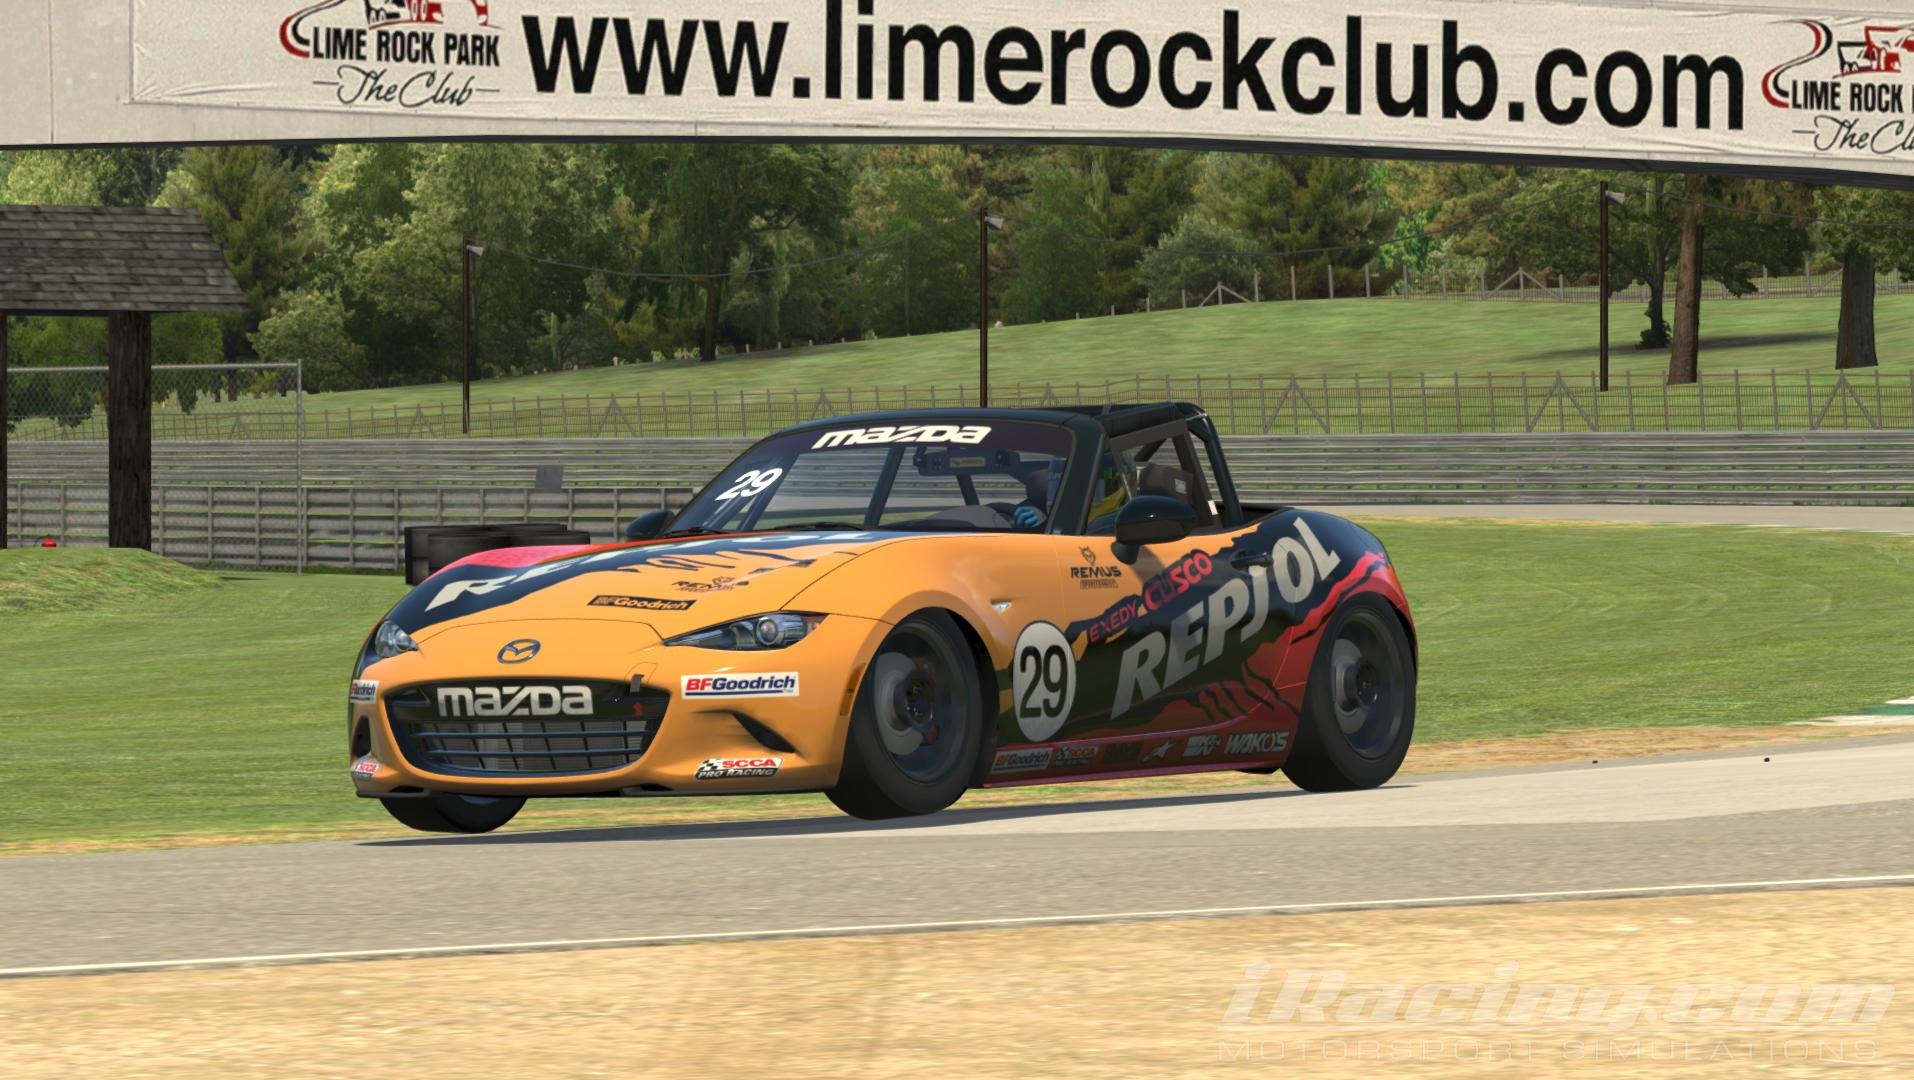 Preview of Global Mazda MX5 Repsol by Christian Kistner